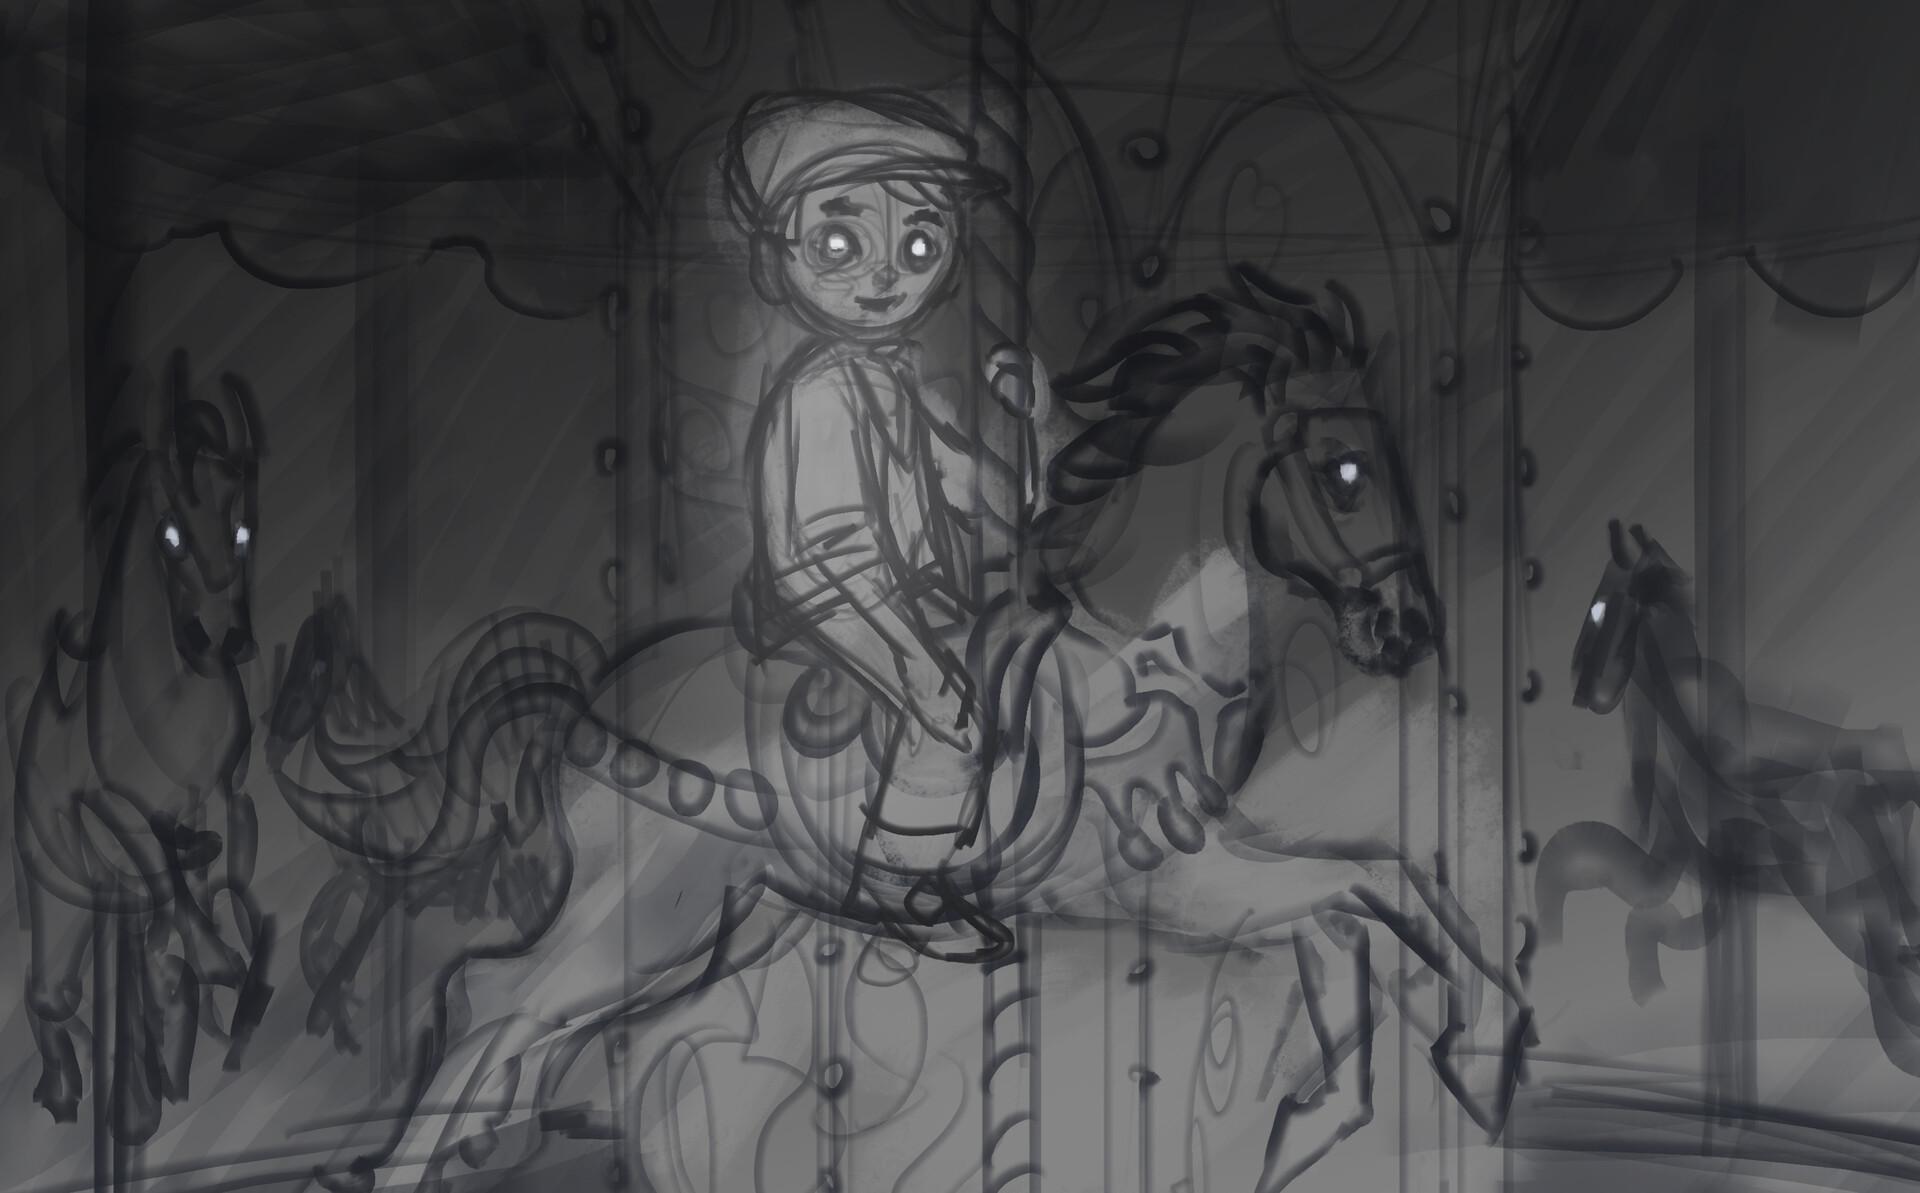 Thomas bourdon cursed caroussel sketch